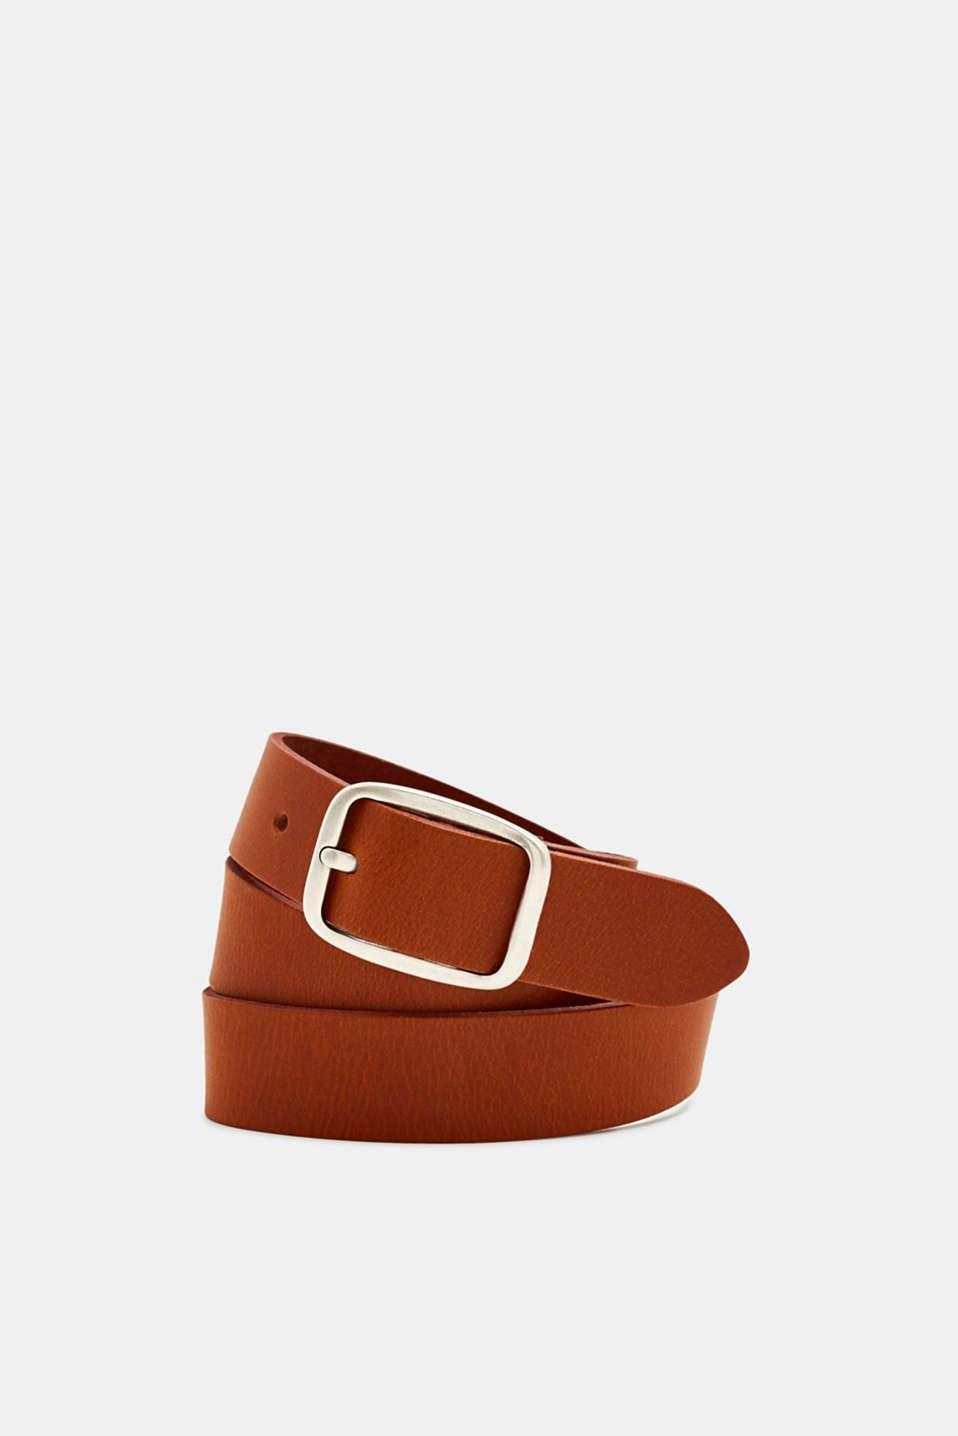 Leather belt, RUST BROWN, detail image number 0